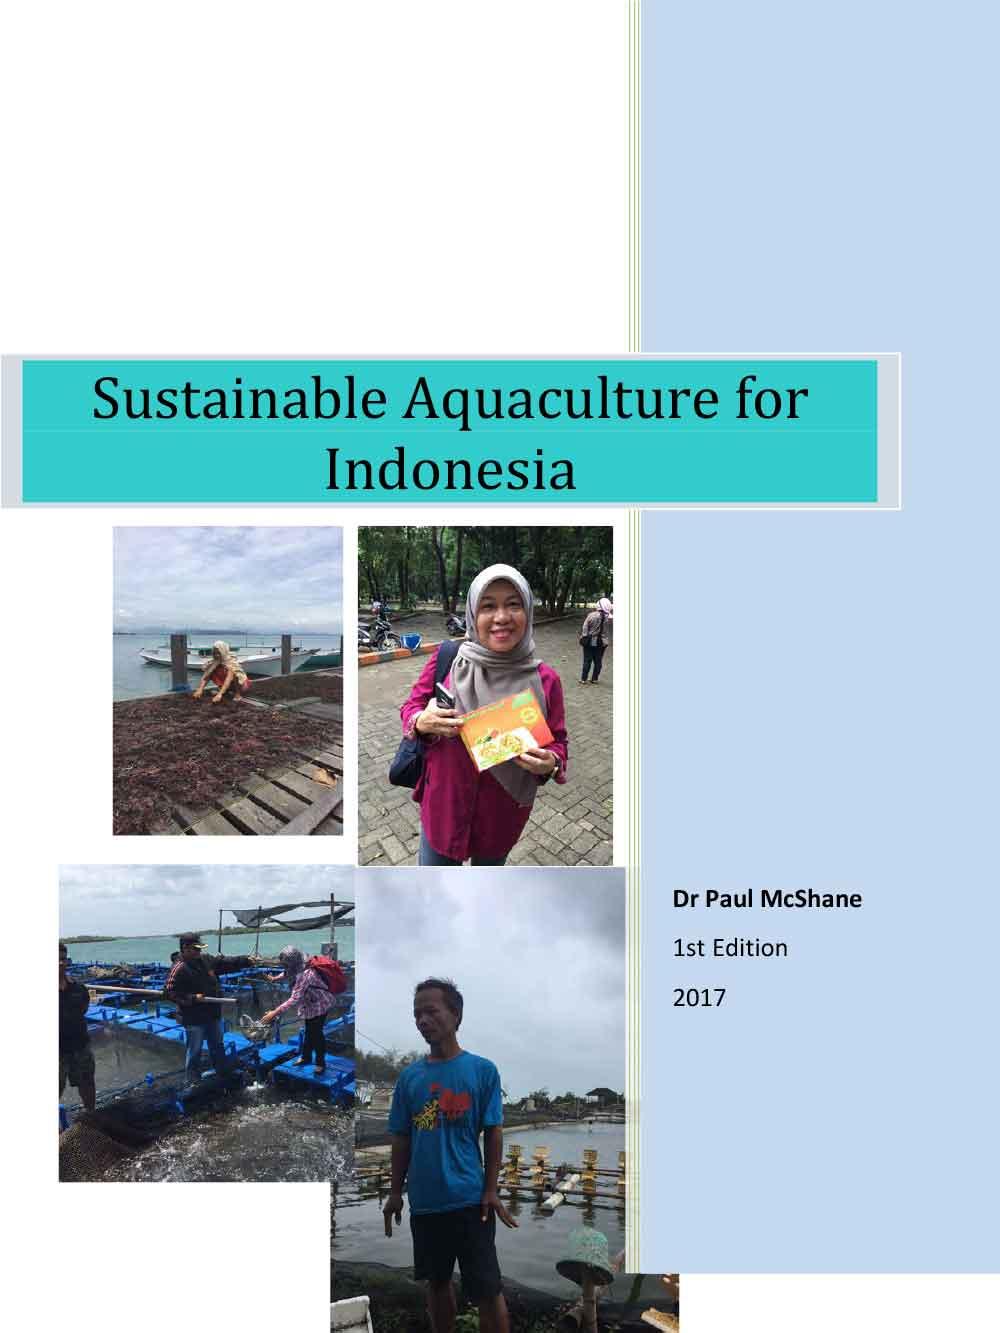 Sustainable Aquaculture for Indonesia